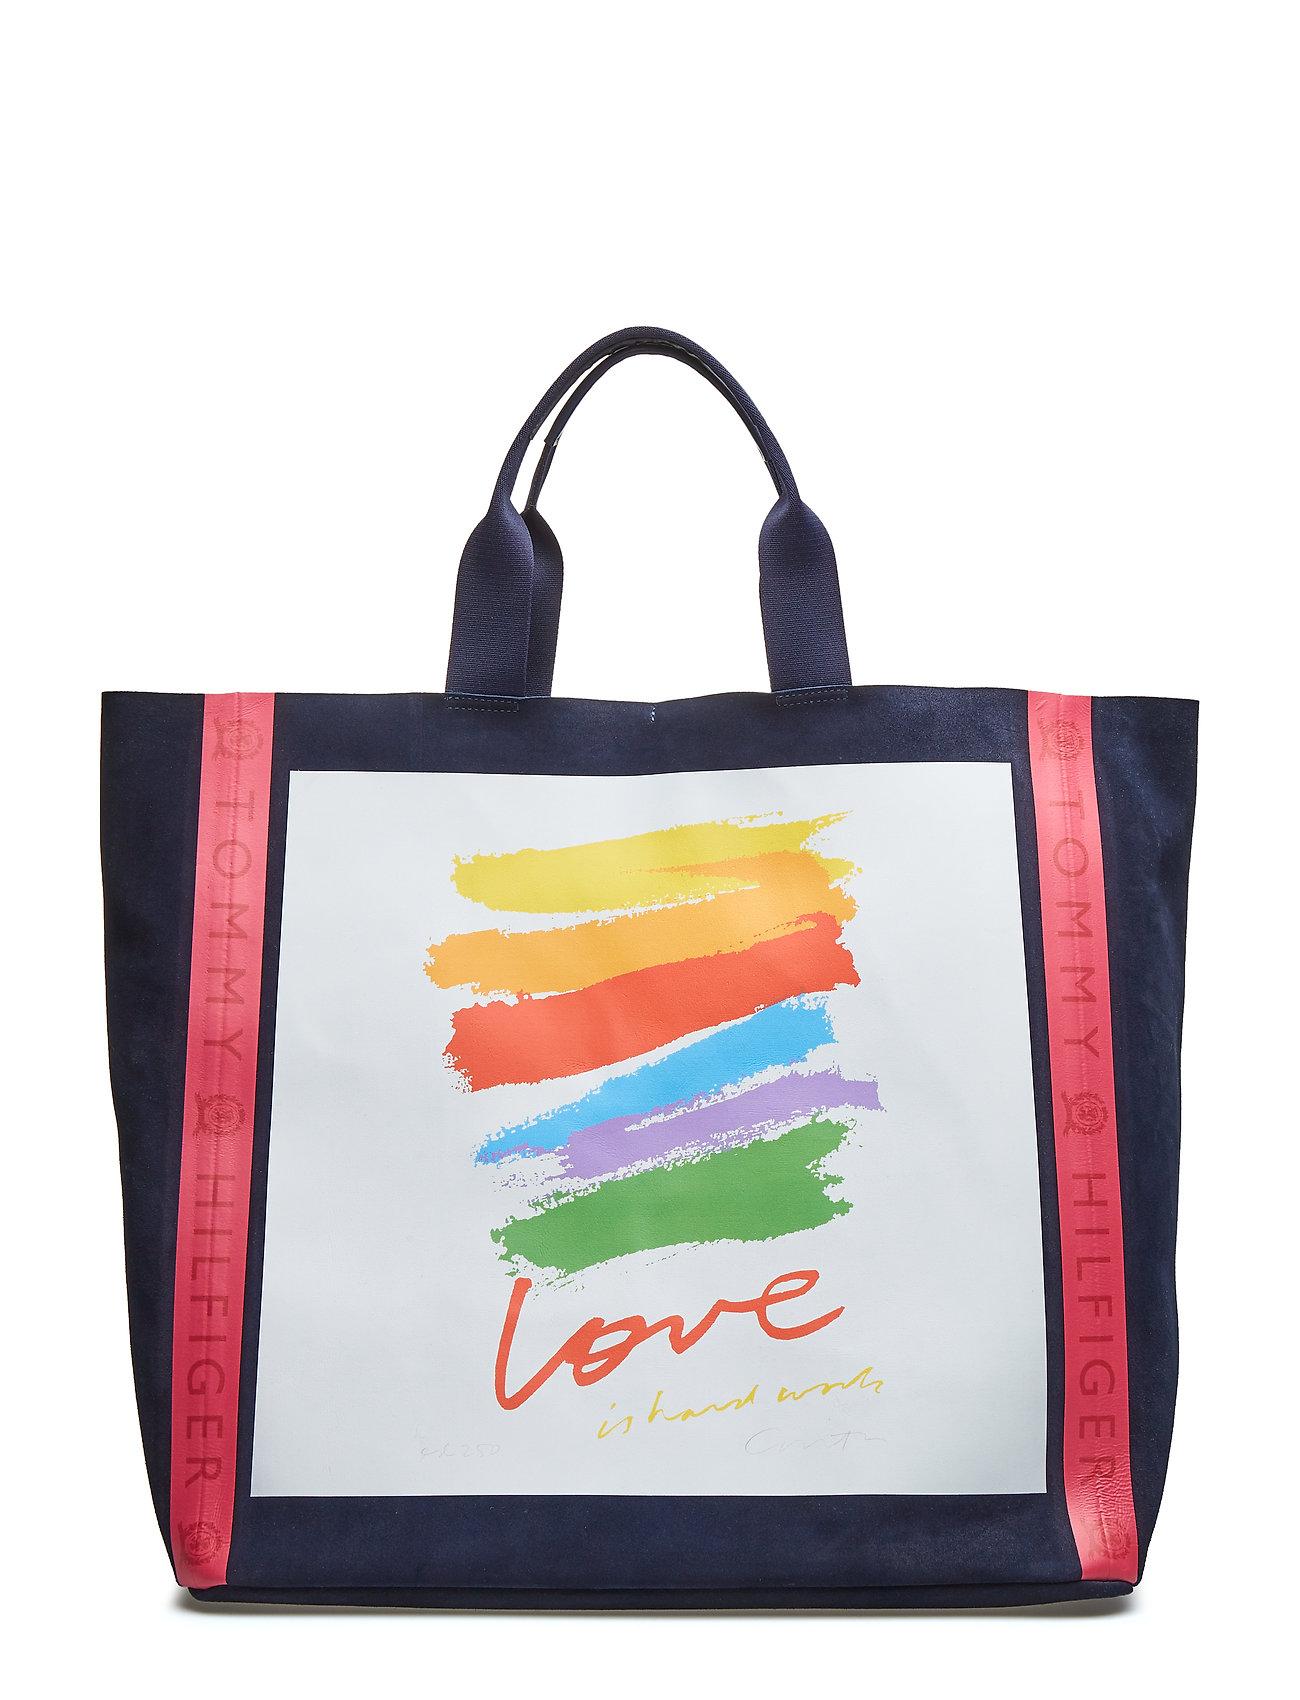 Hc Love Shopper - Hilfiger Collection